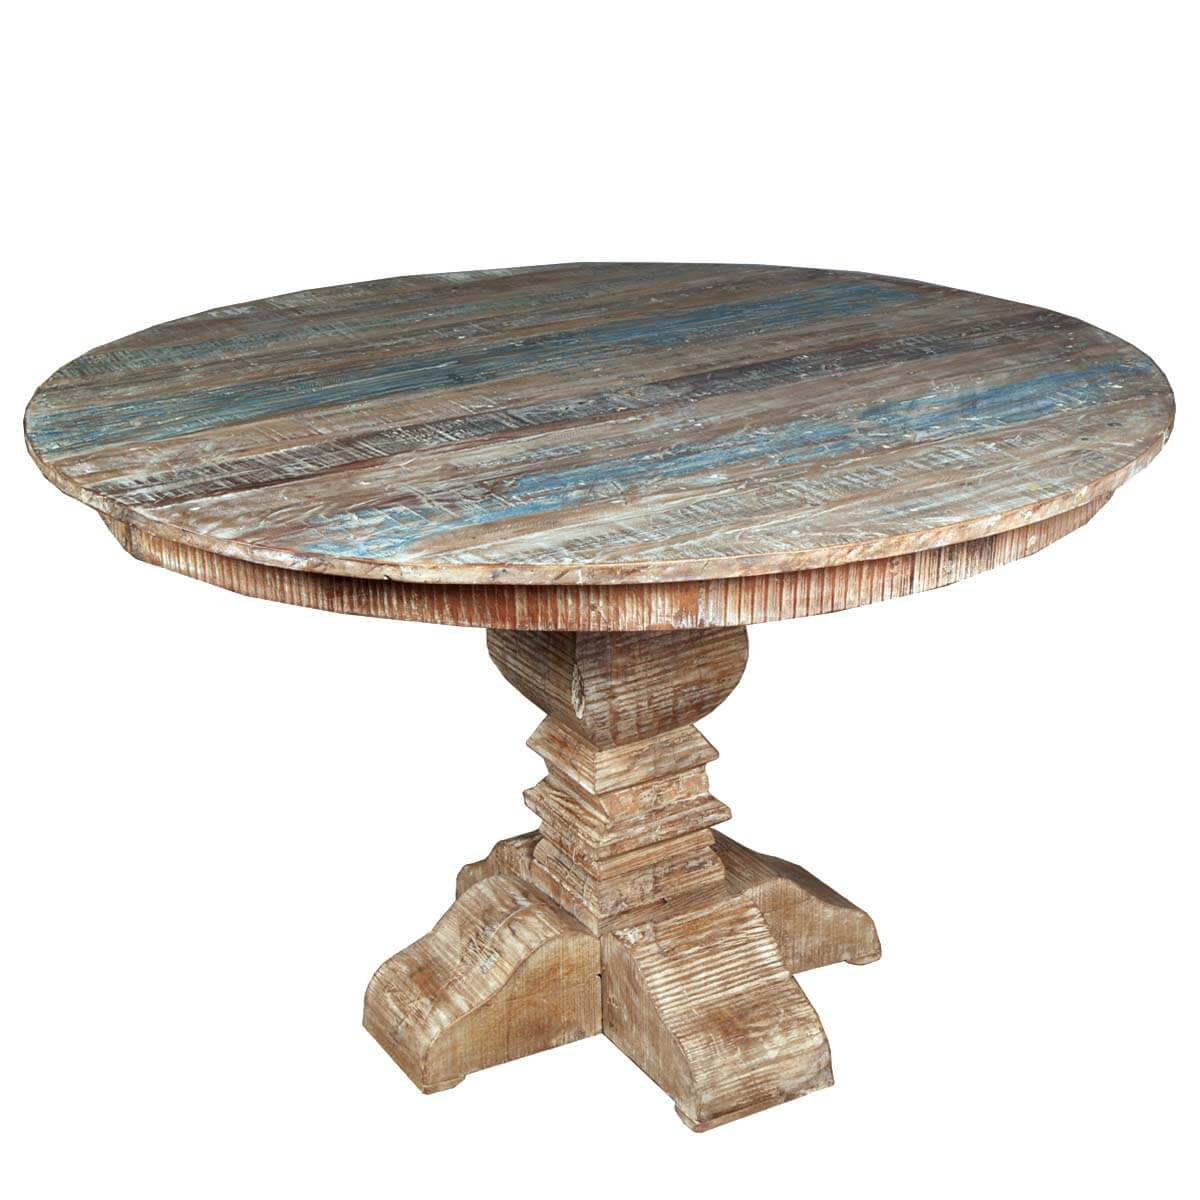 Fantastic French Quarter Rustic Reclaimed Wood Round Table Reclaimed Wood Tables Sale Reclaimed Wood Table Houston houzz-03 Reclaimed Wood Dining Table